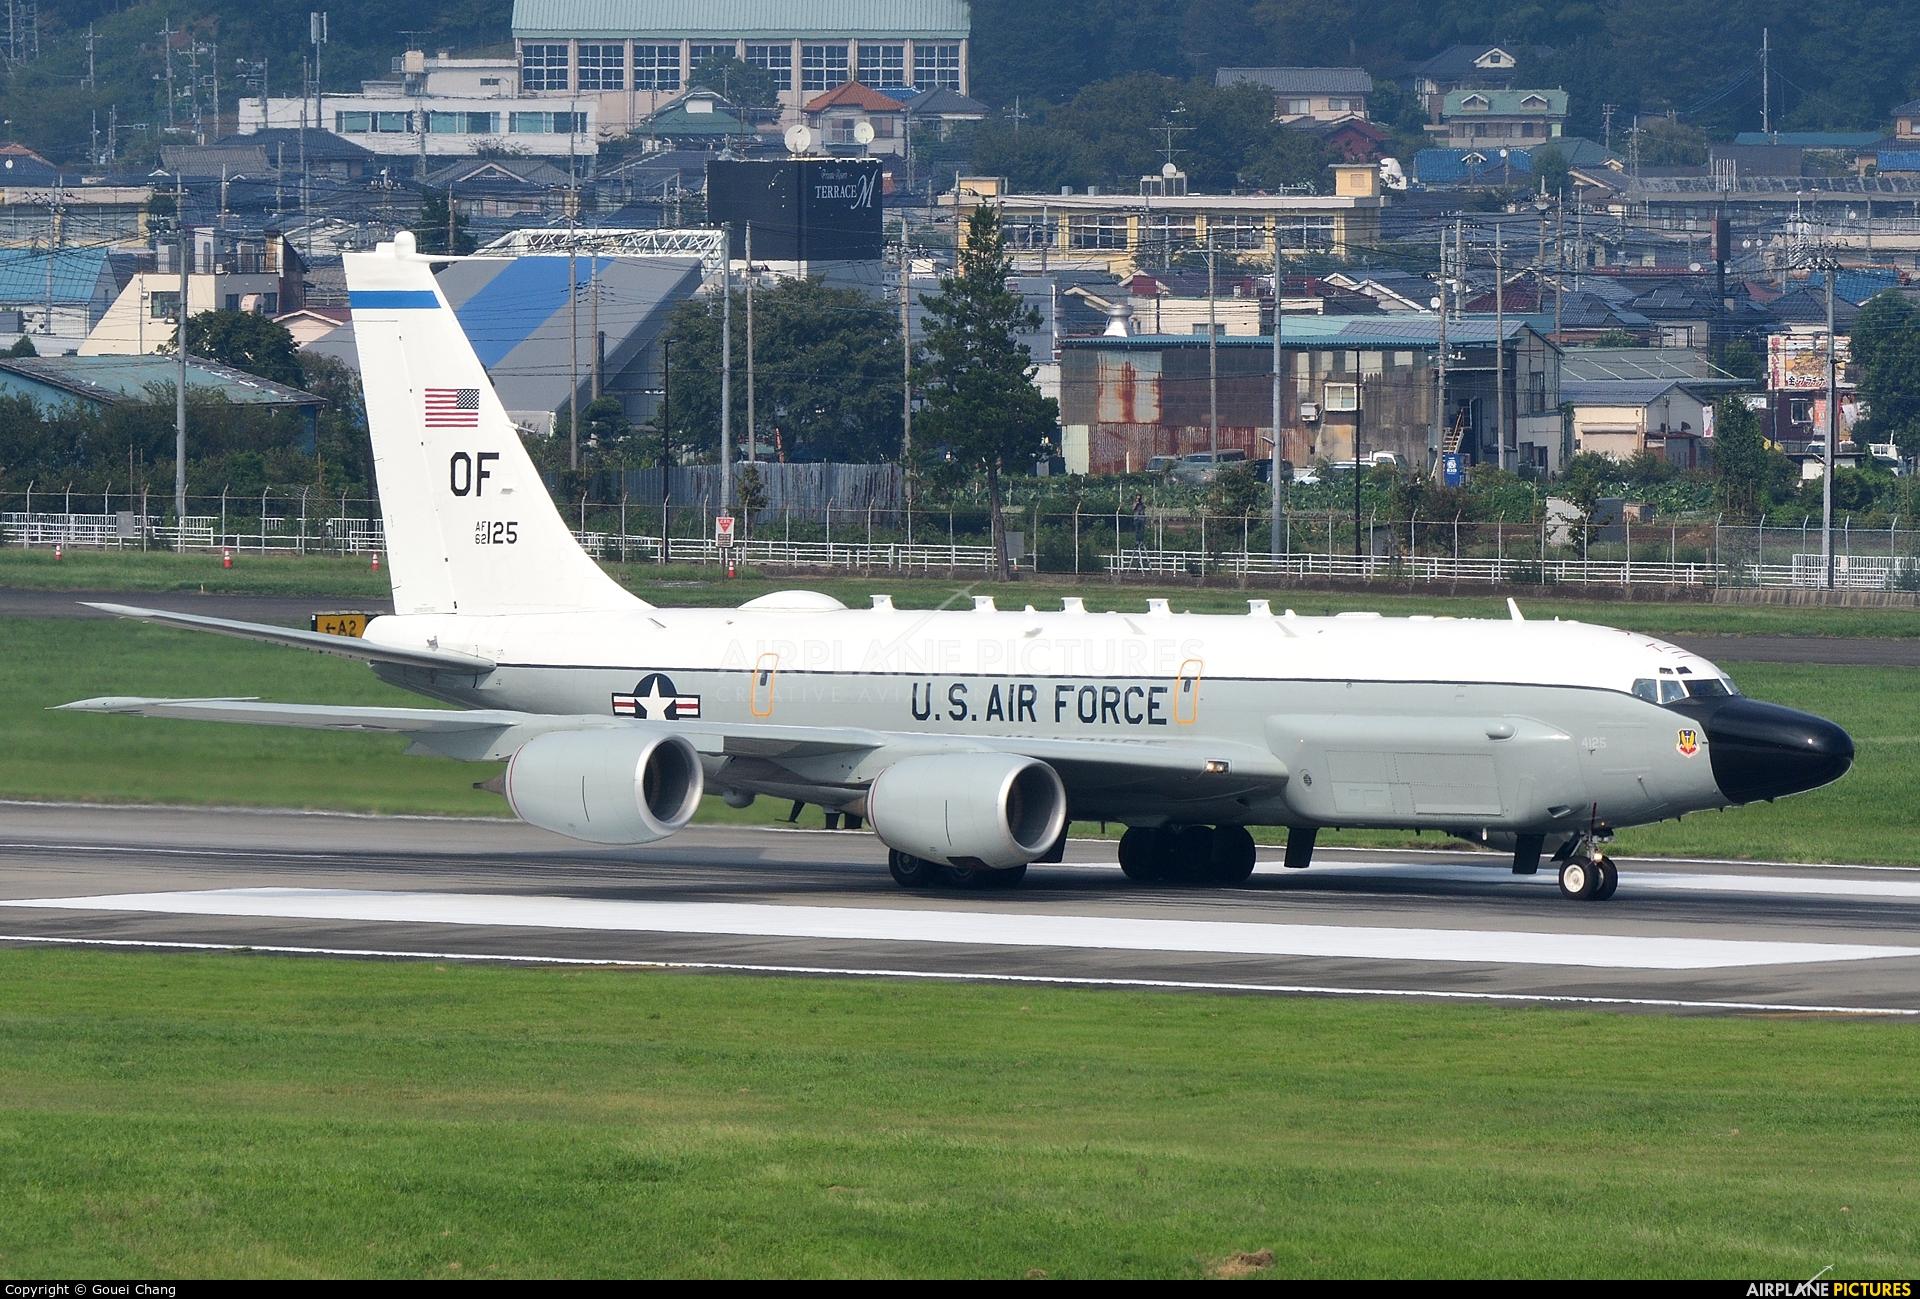 USA - Air Force 62-4125 aircraft at Yokota AB